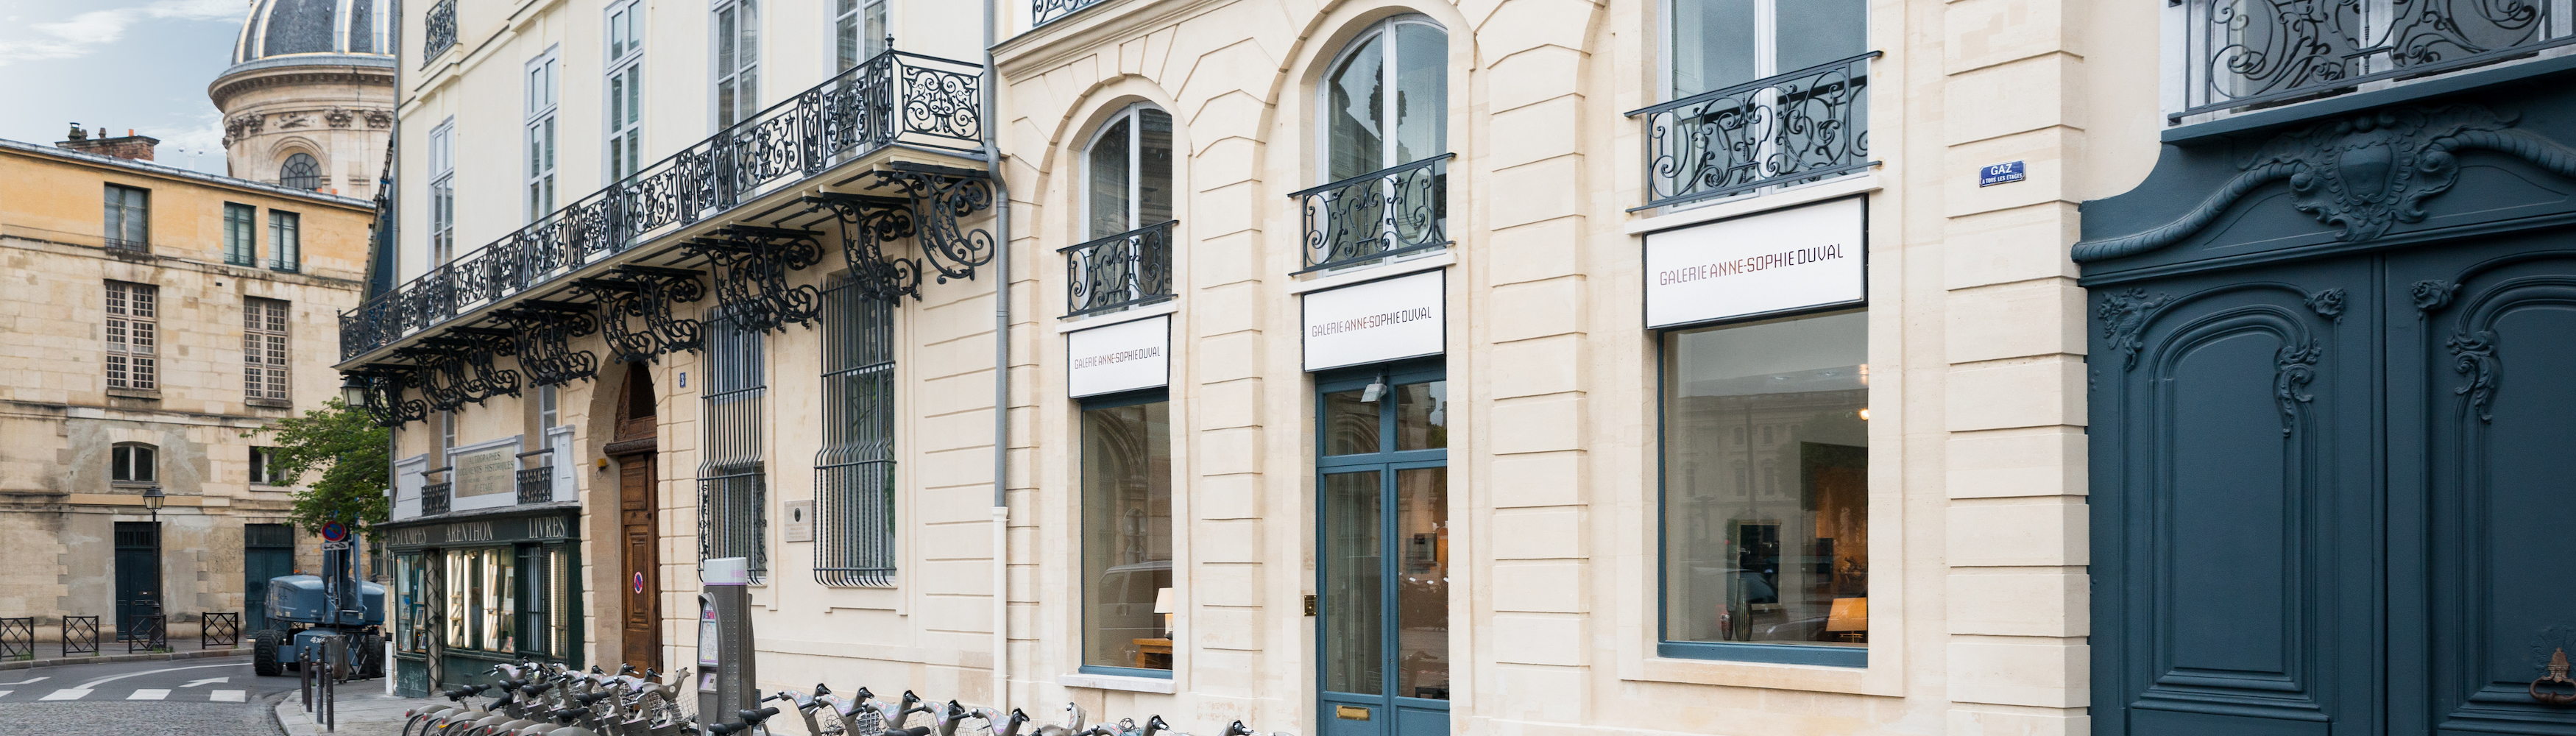 ASD vitrines malaquais copie.jpg